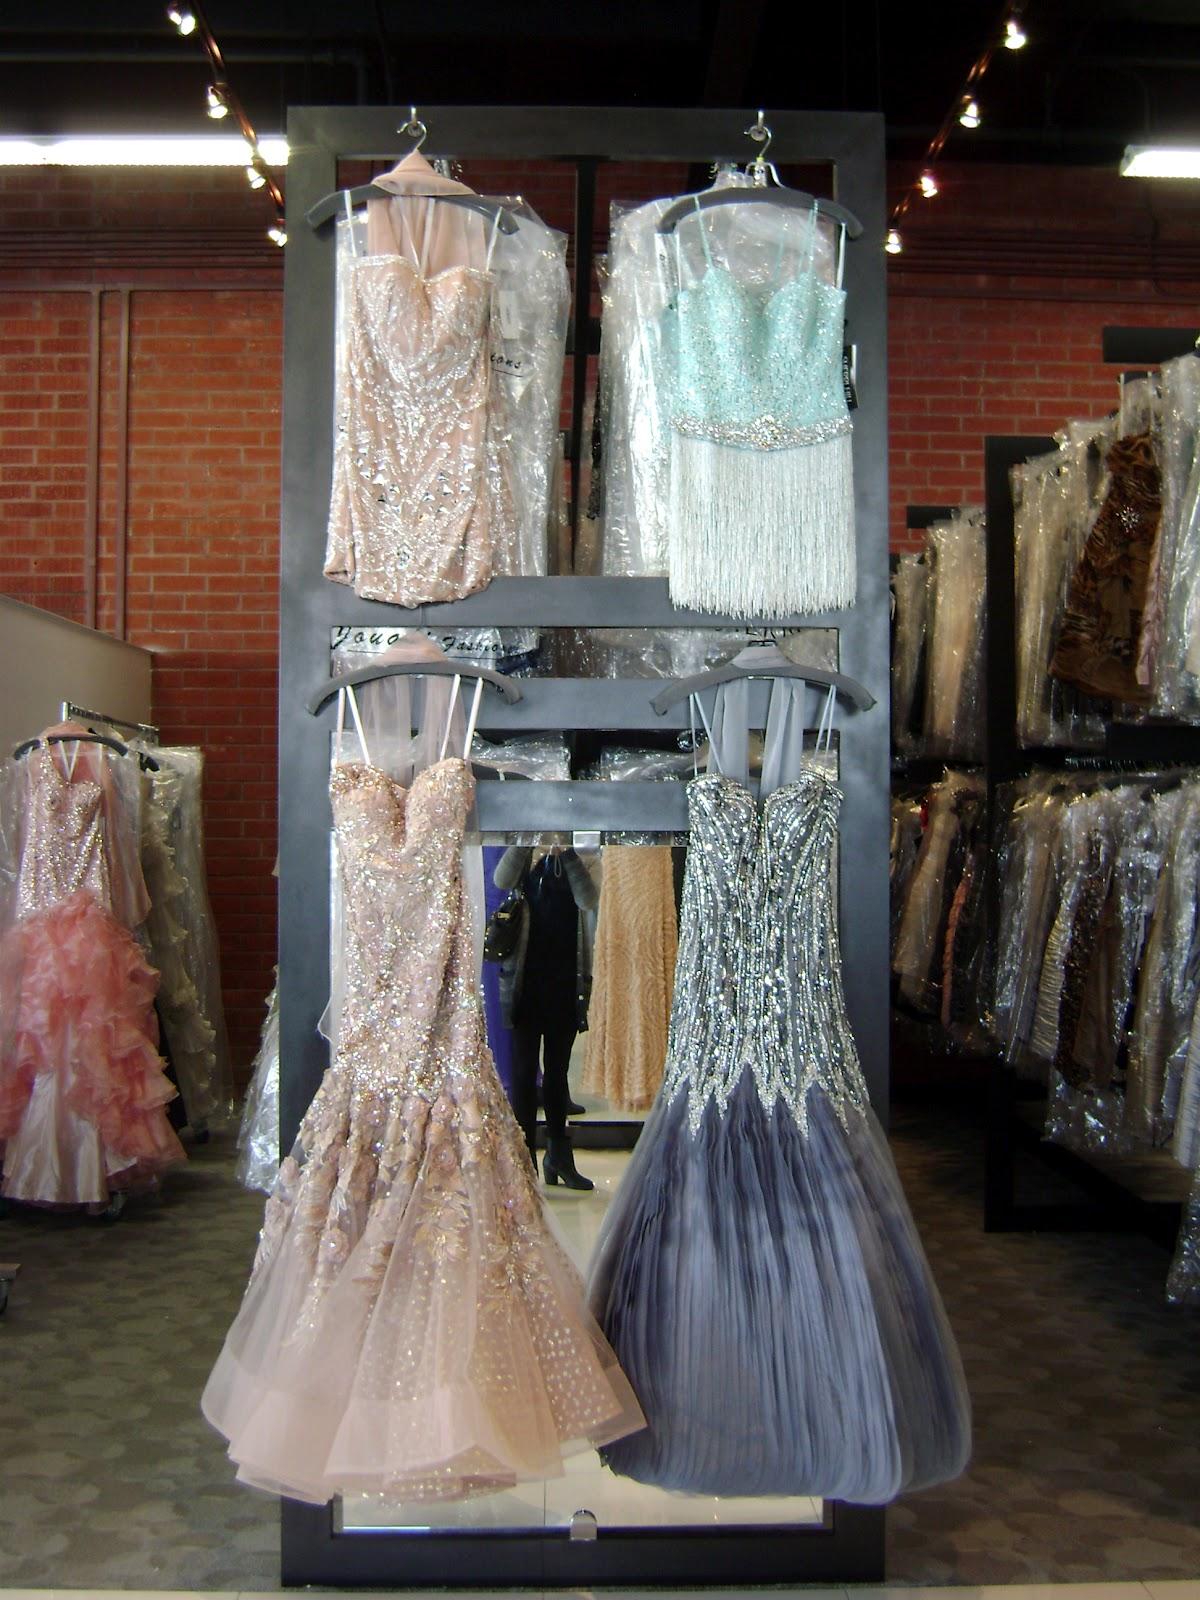 Prom Dresses Prom Dresses Garment District Los Angeles